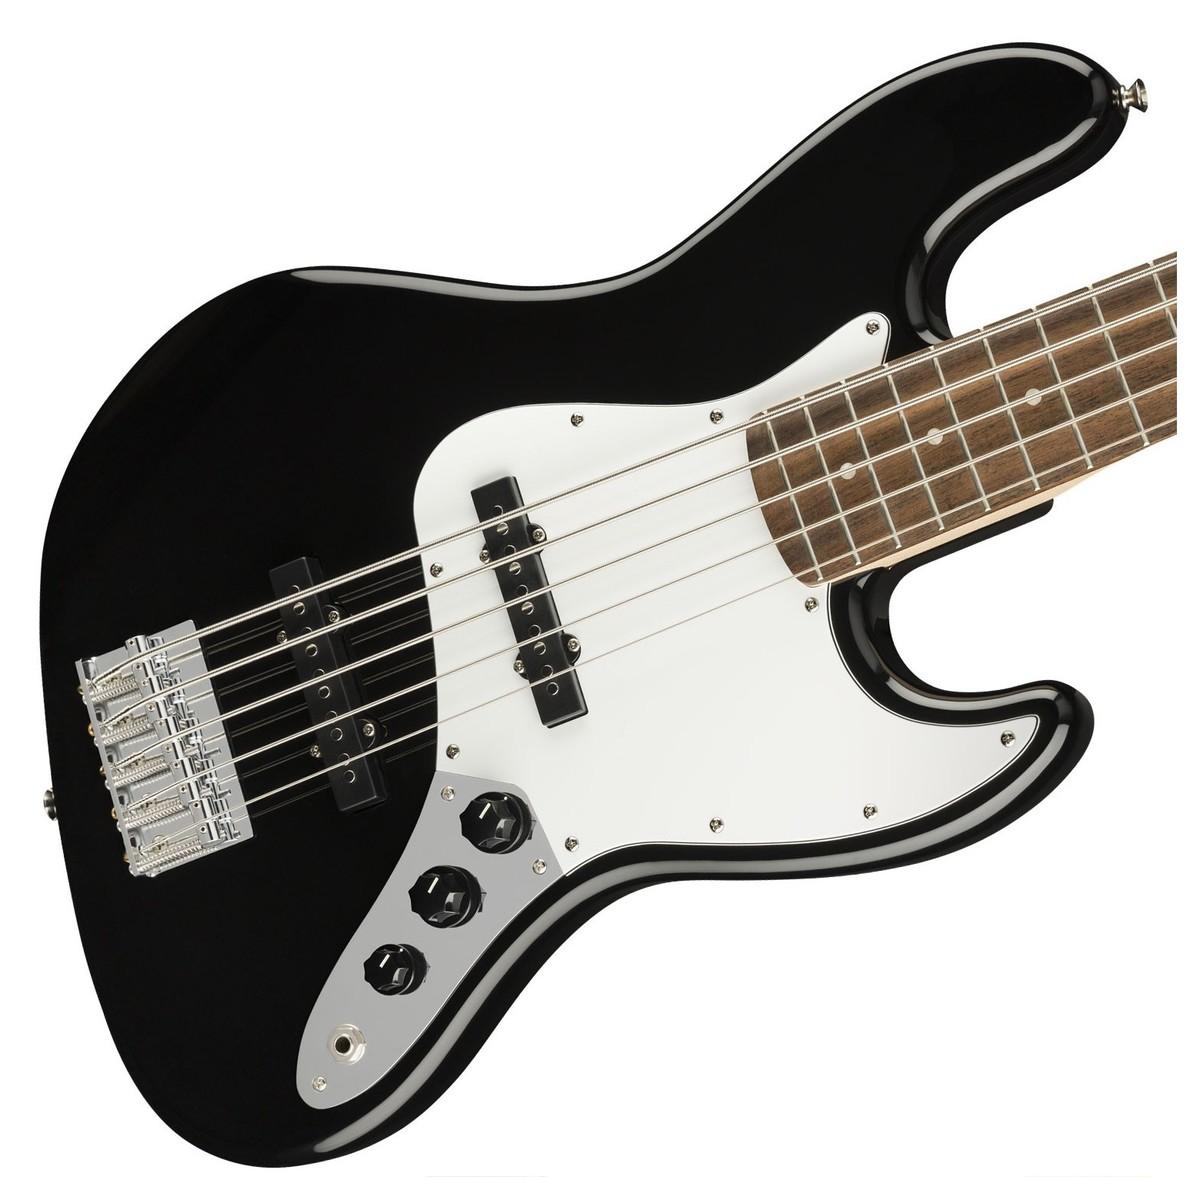 squier affinity jazz bass v 5 string black at gear4music. Black Bedroom Furniture Sets. Home Design Ideas